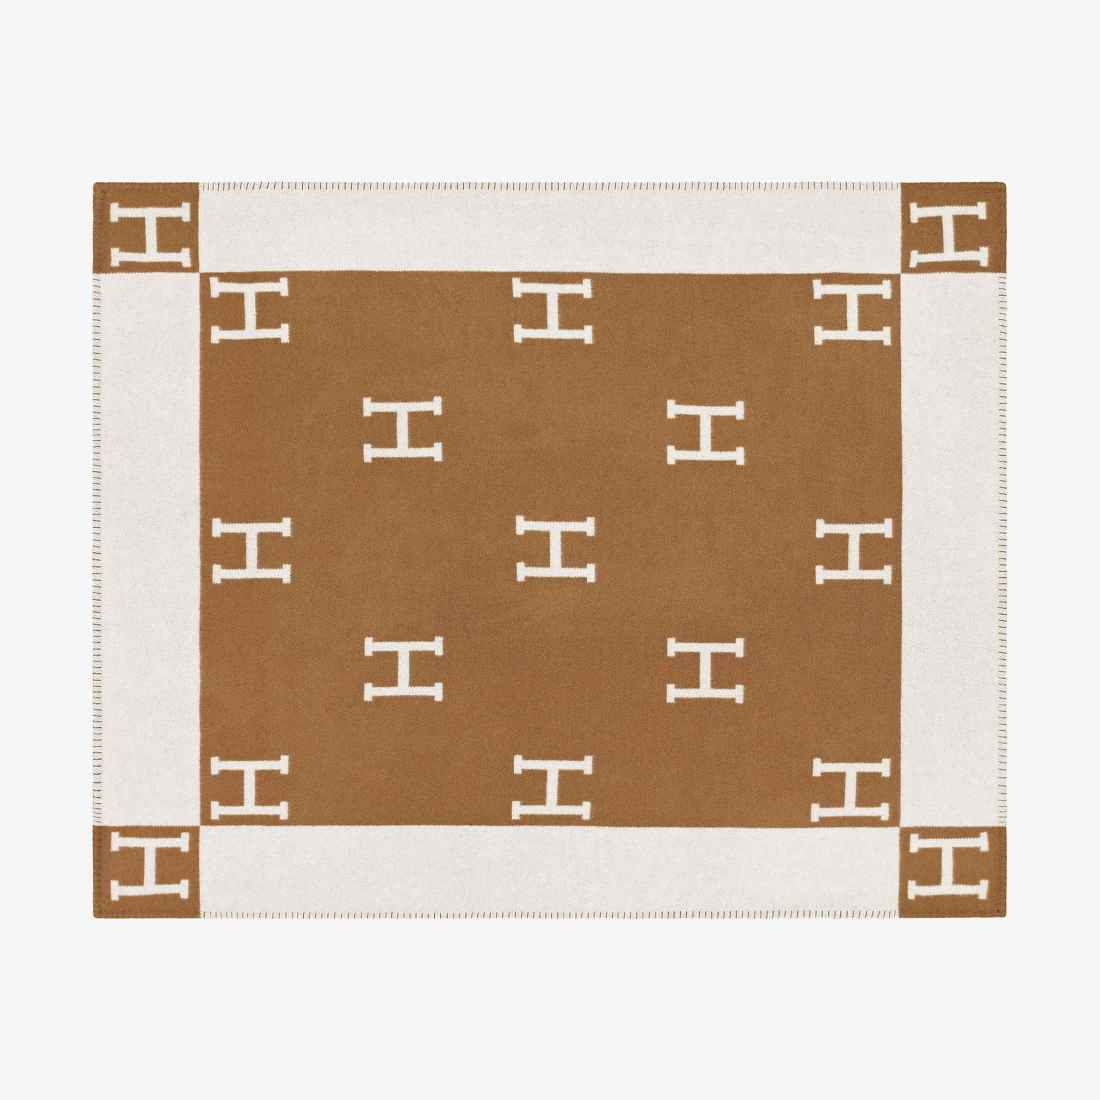 avalon-throw-blanket--102668M 52-front-1-300-0-2048-2048-q40